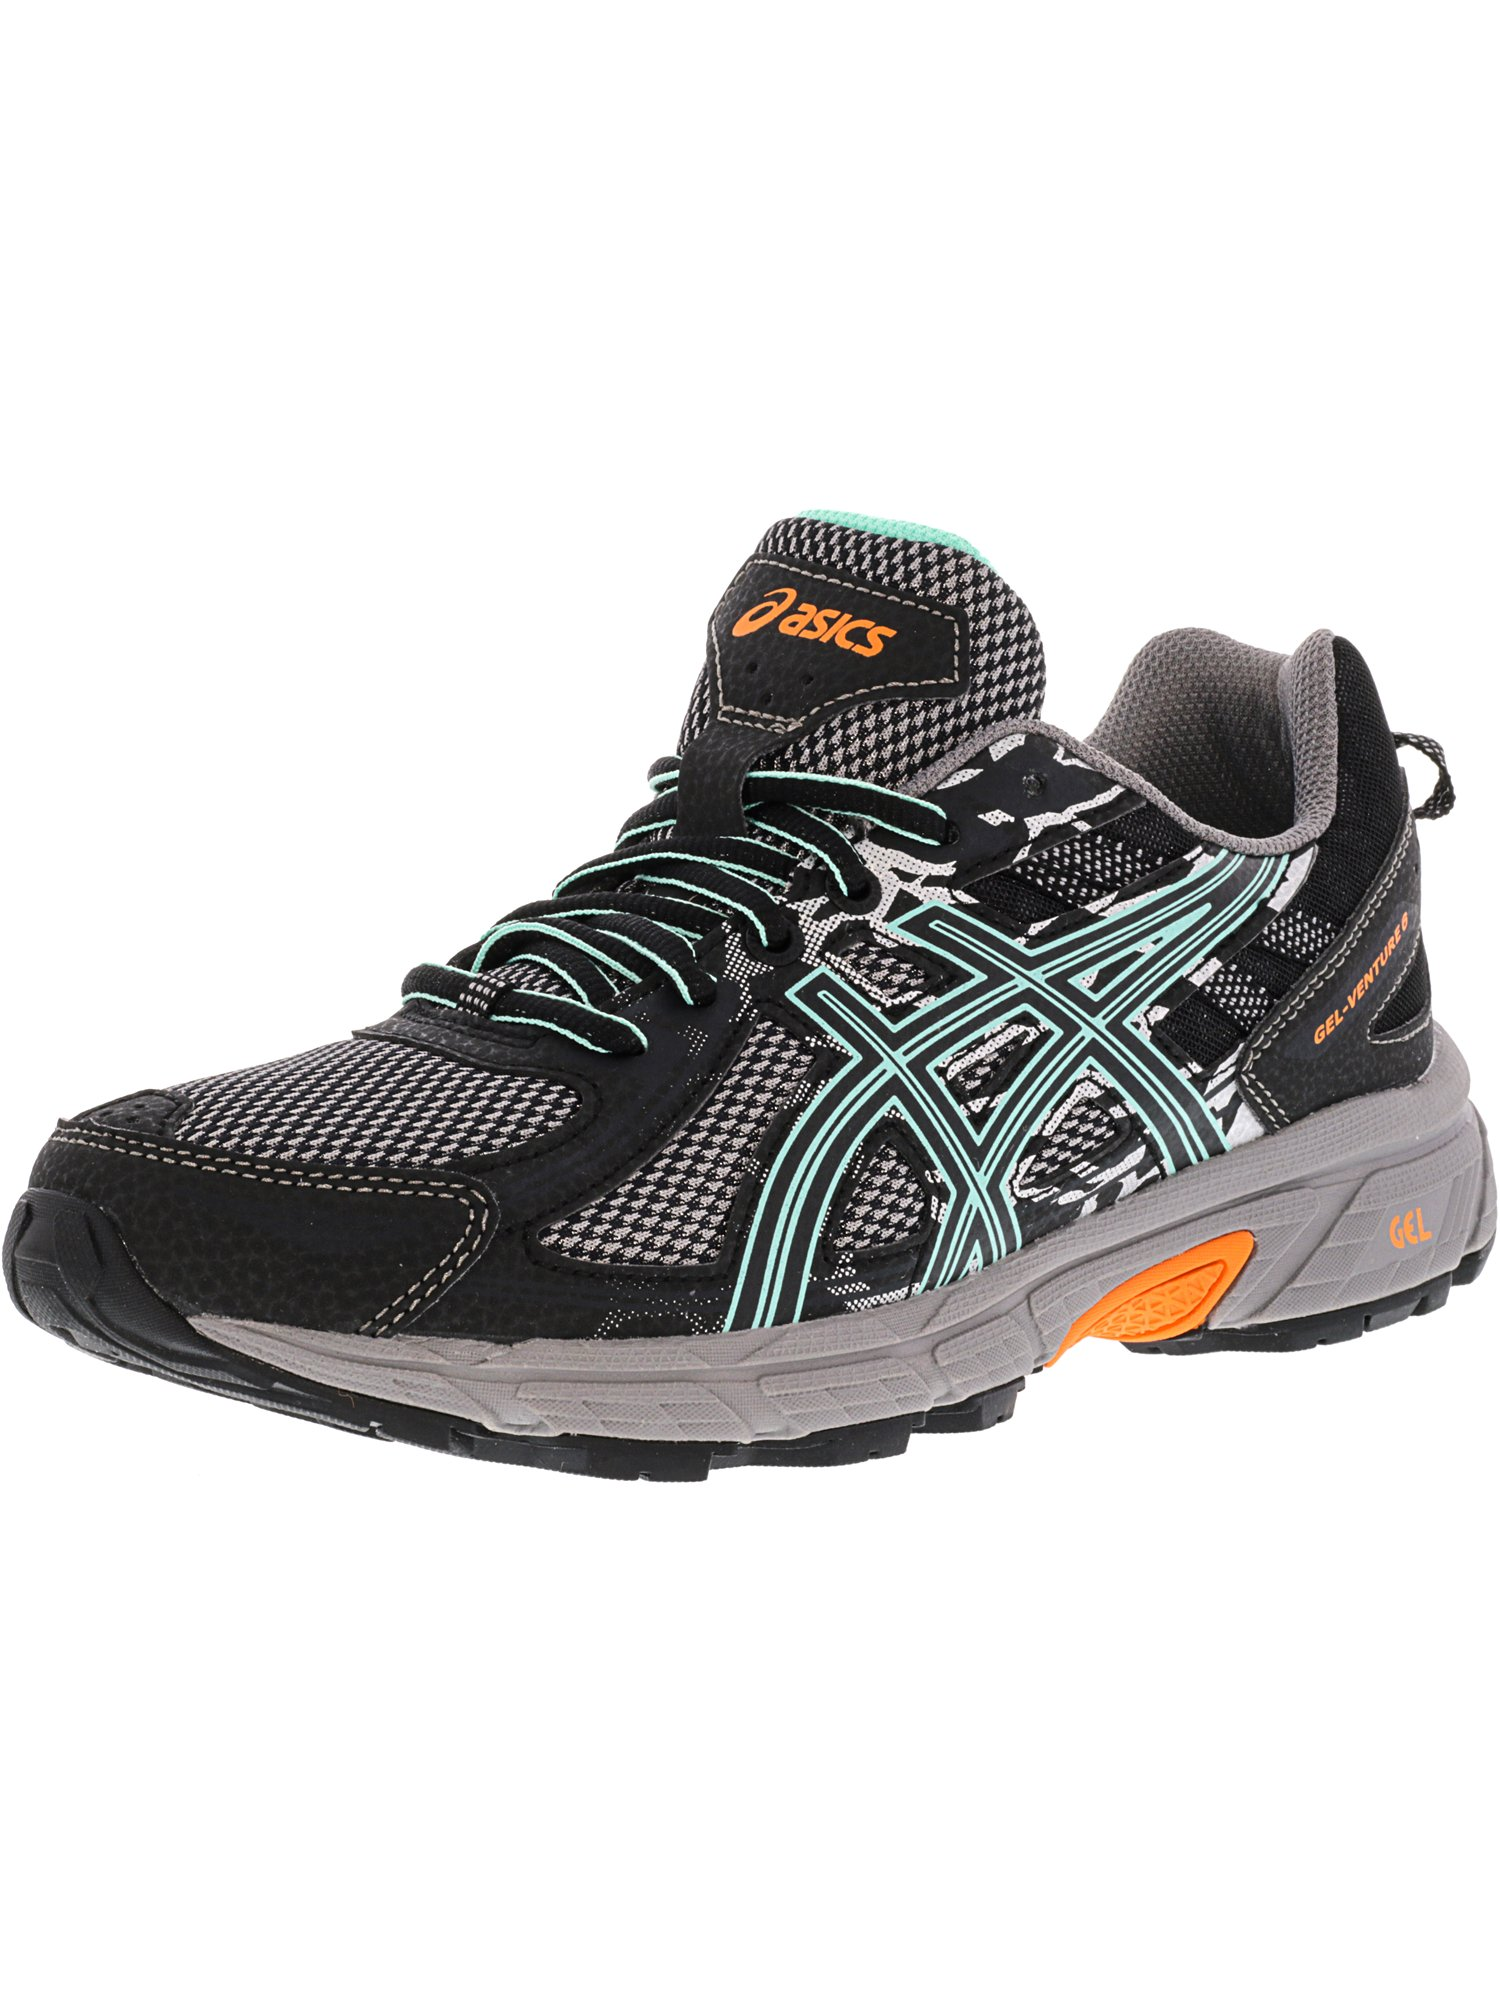 Asics Women's Gel-Venture 6 Black / Carbon Neon Lime Ankle-High Running Shoe - 10.5M